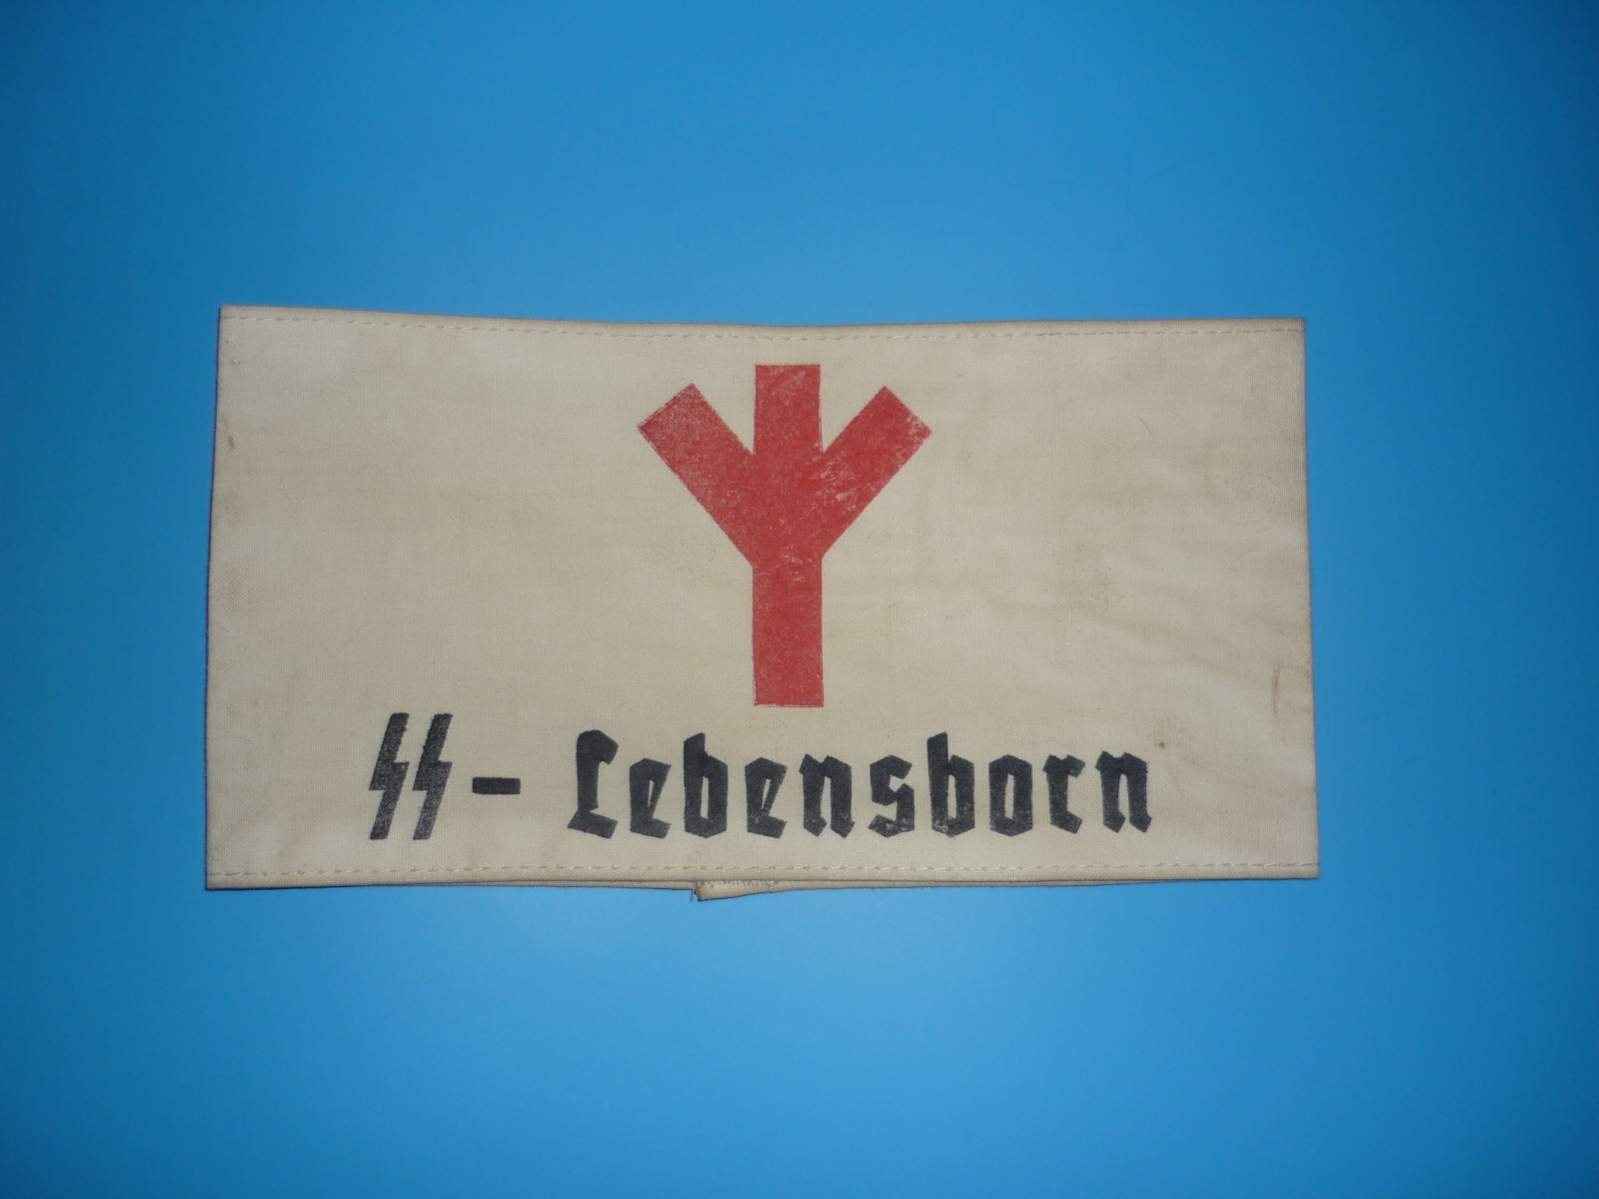 http://www.warrelics.eu/forum/attachments/non-combat-uniforms-related-insignia-third-reich/804589d1424199919-lebensborn-p1040332.jpg